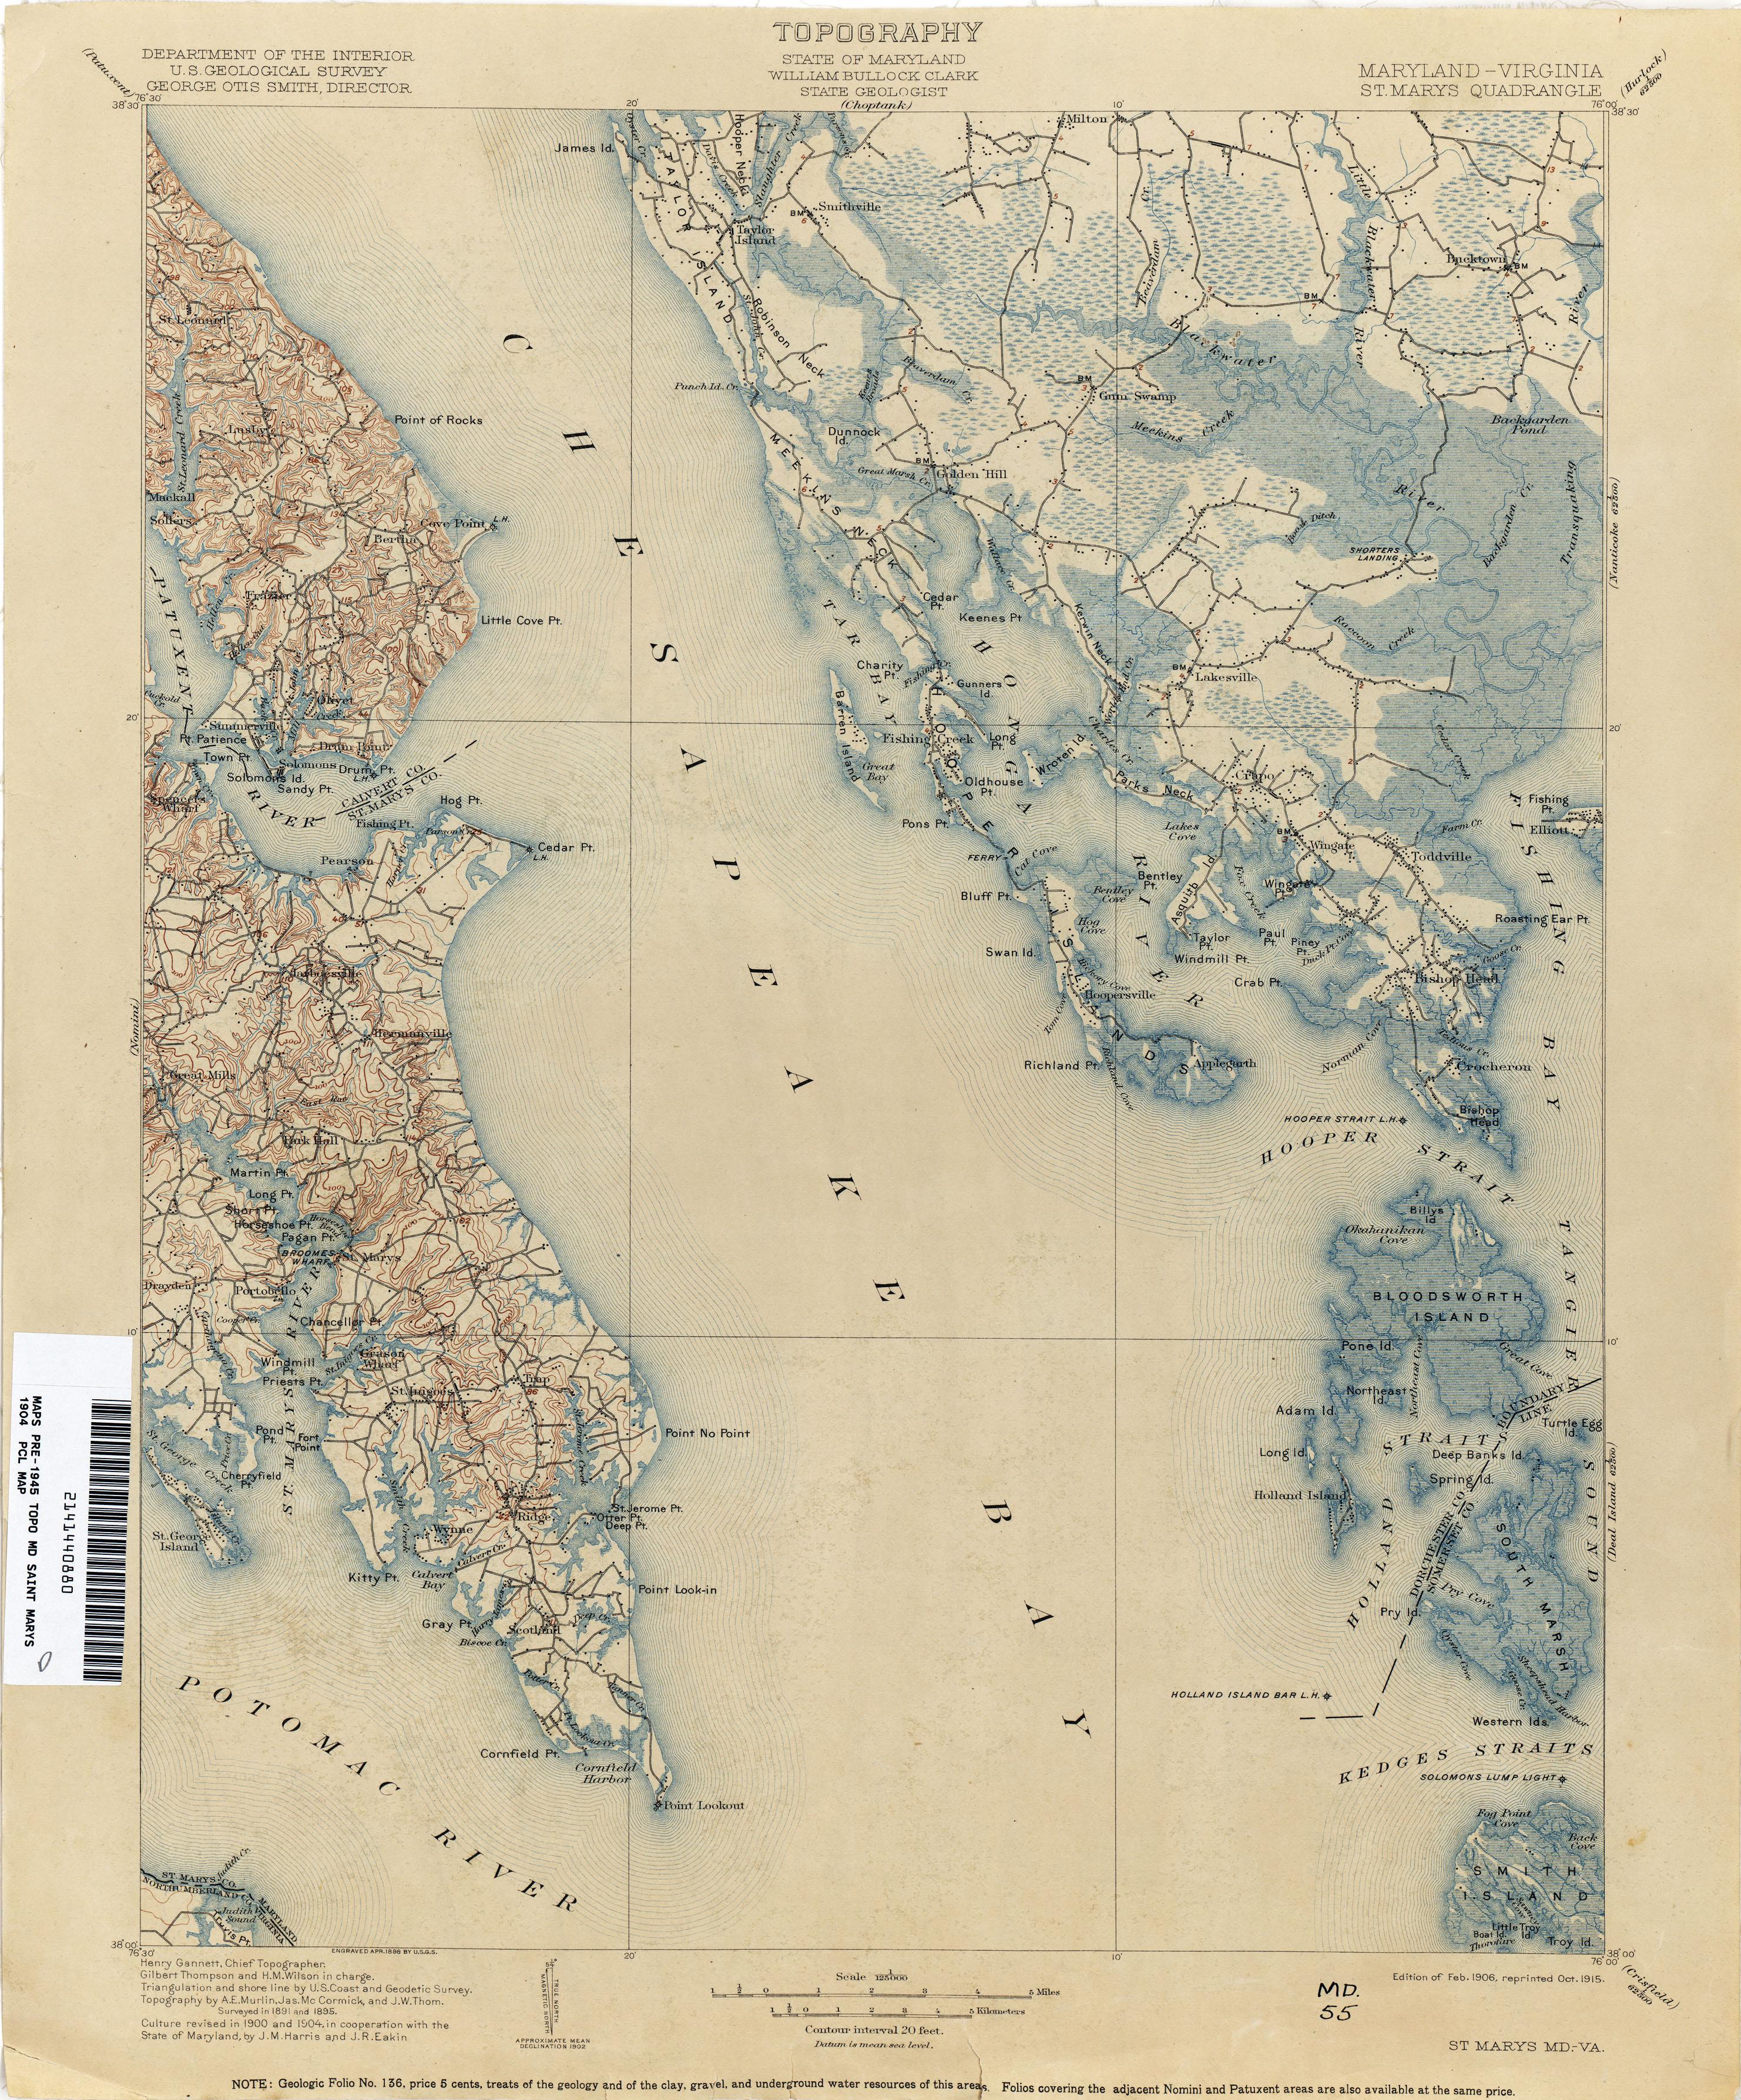 Saint Marys Maryland Historical Topographic Historical Maps